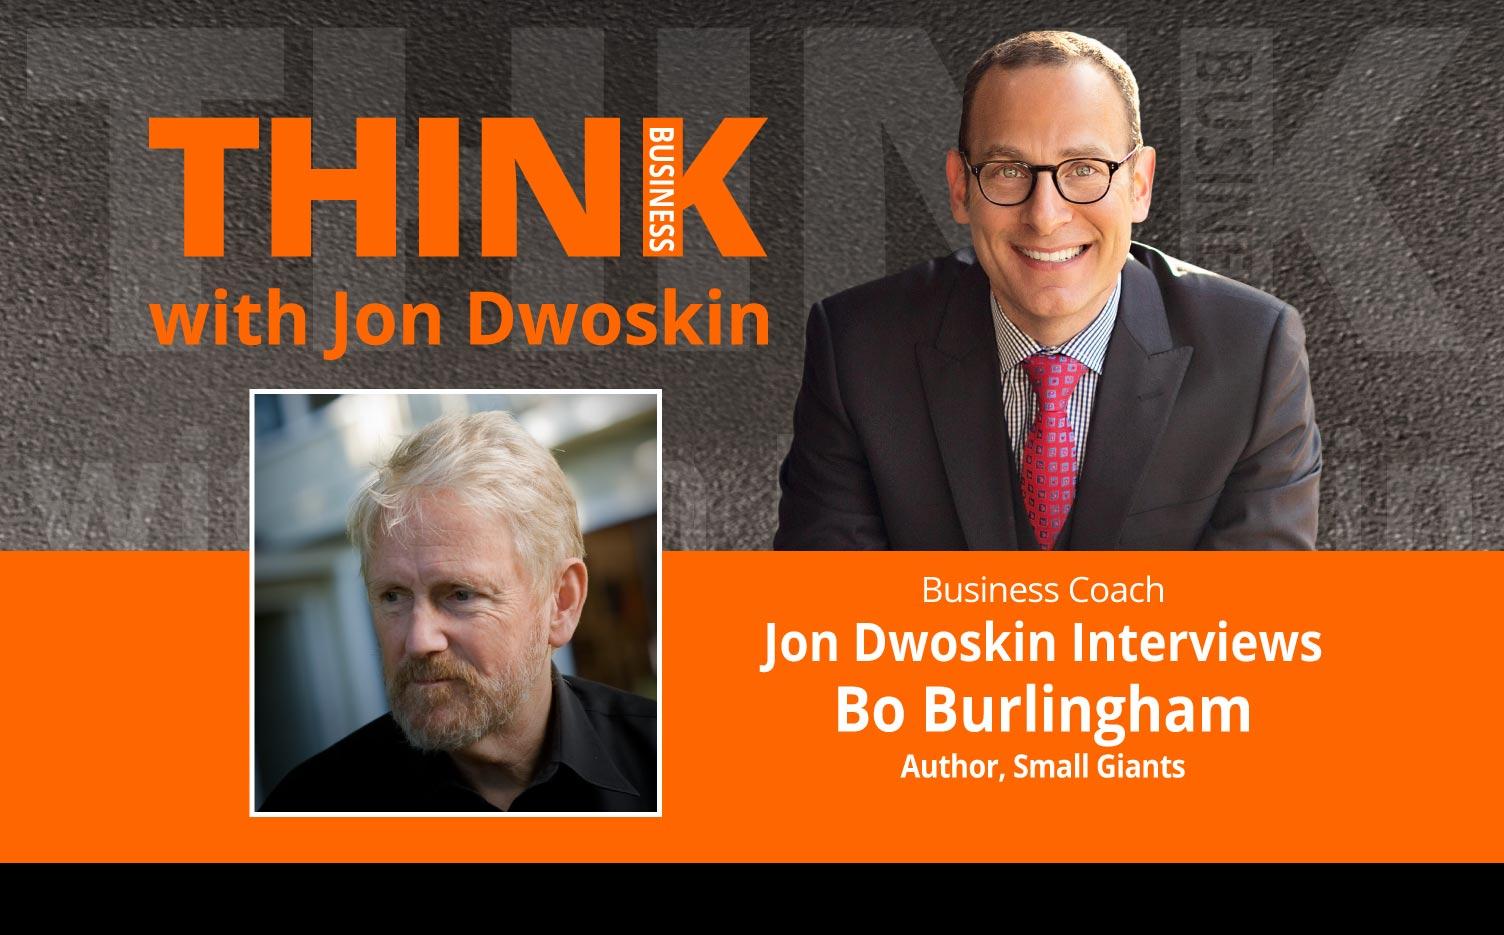 THINK Business Podcast: Jon Dwoskin Interviews Bo Burlingham, Author